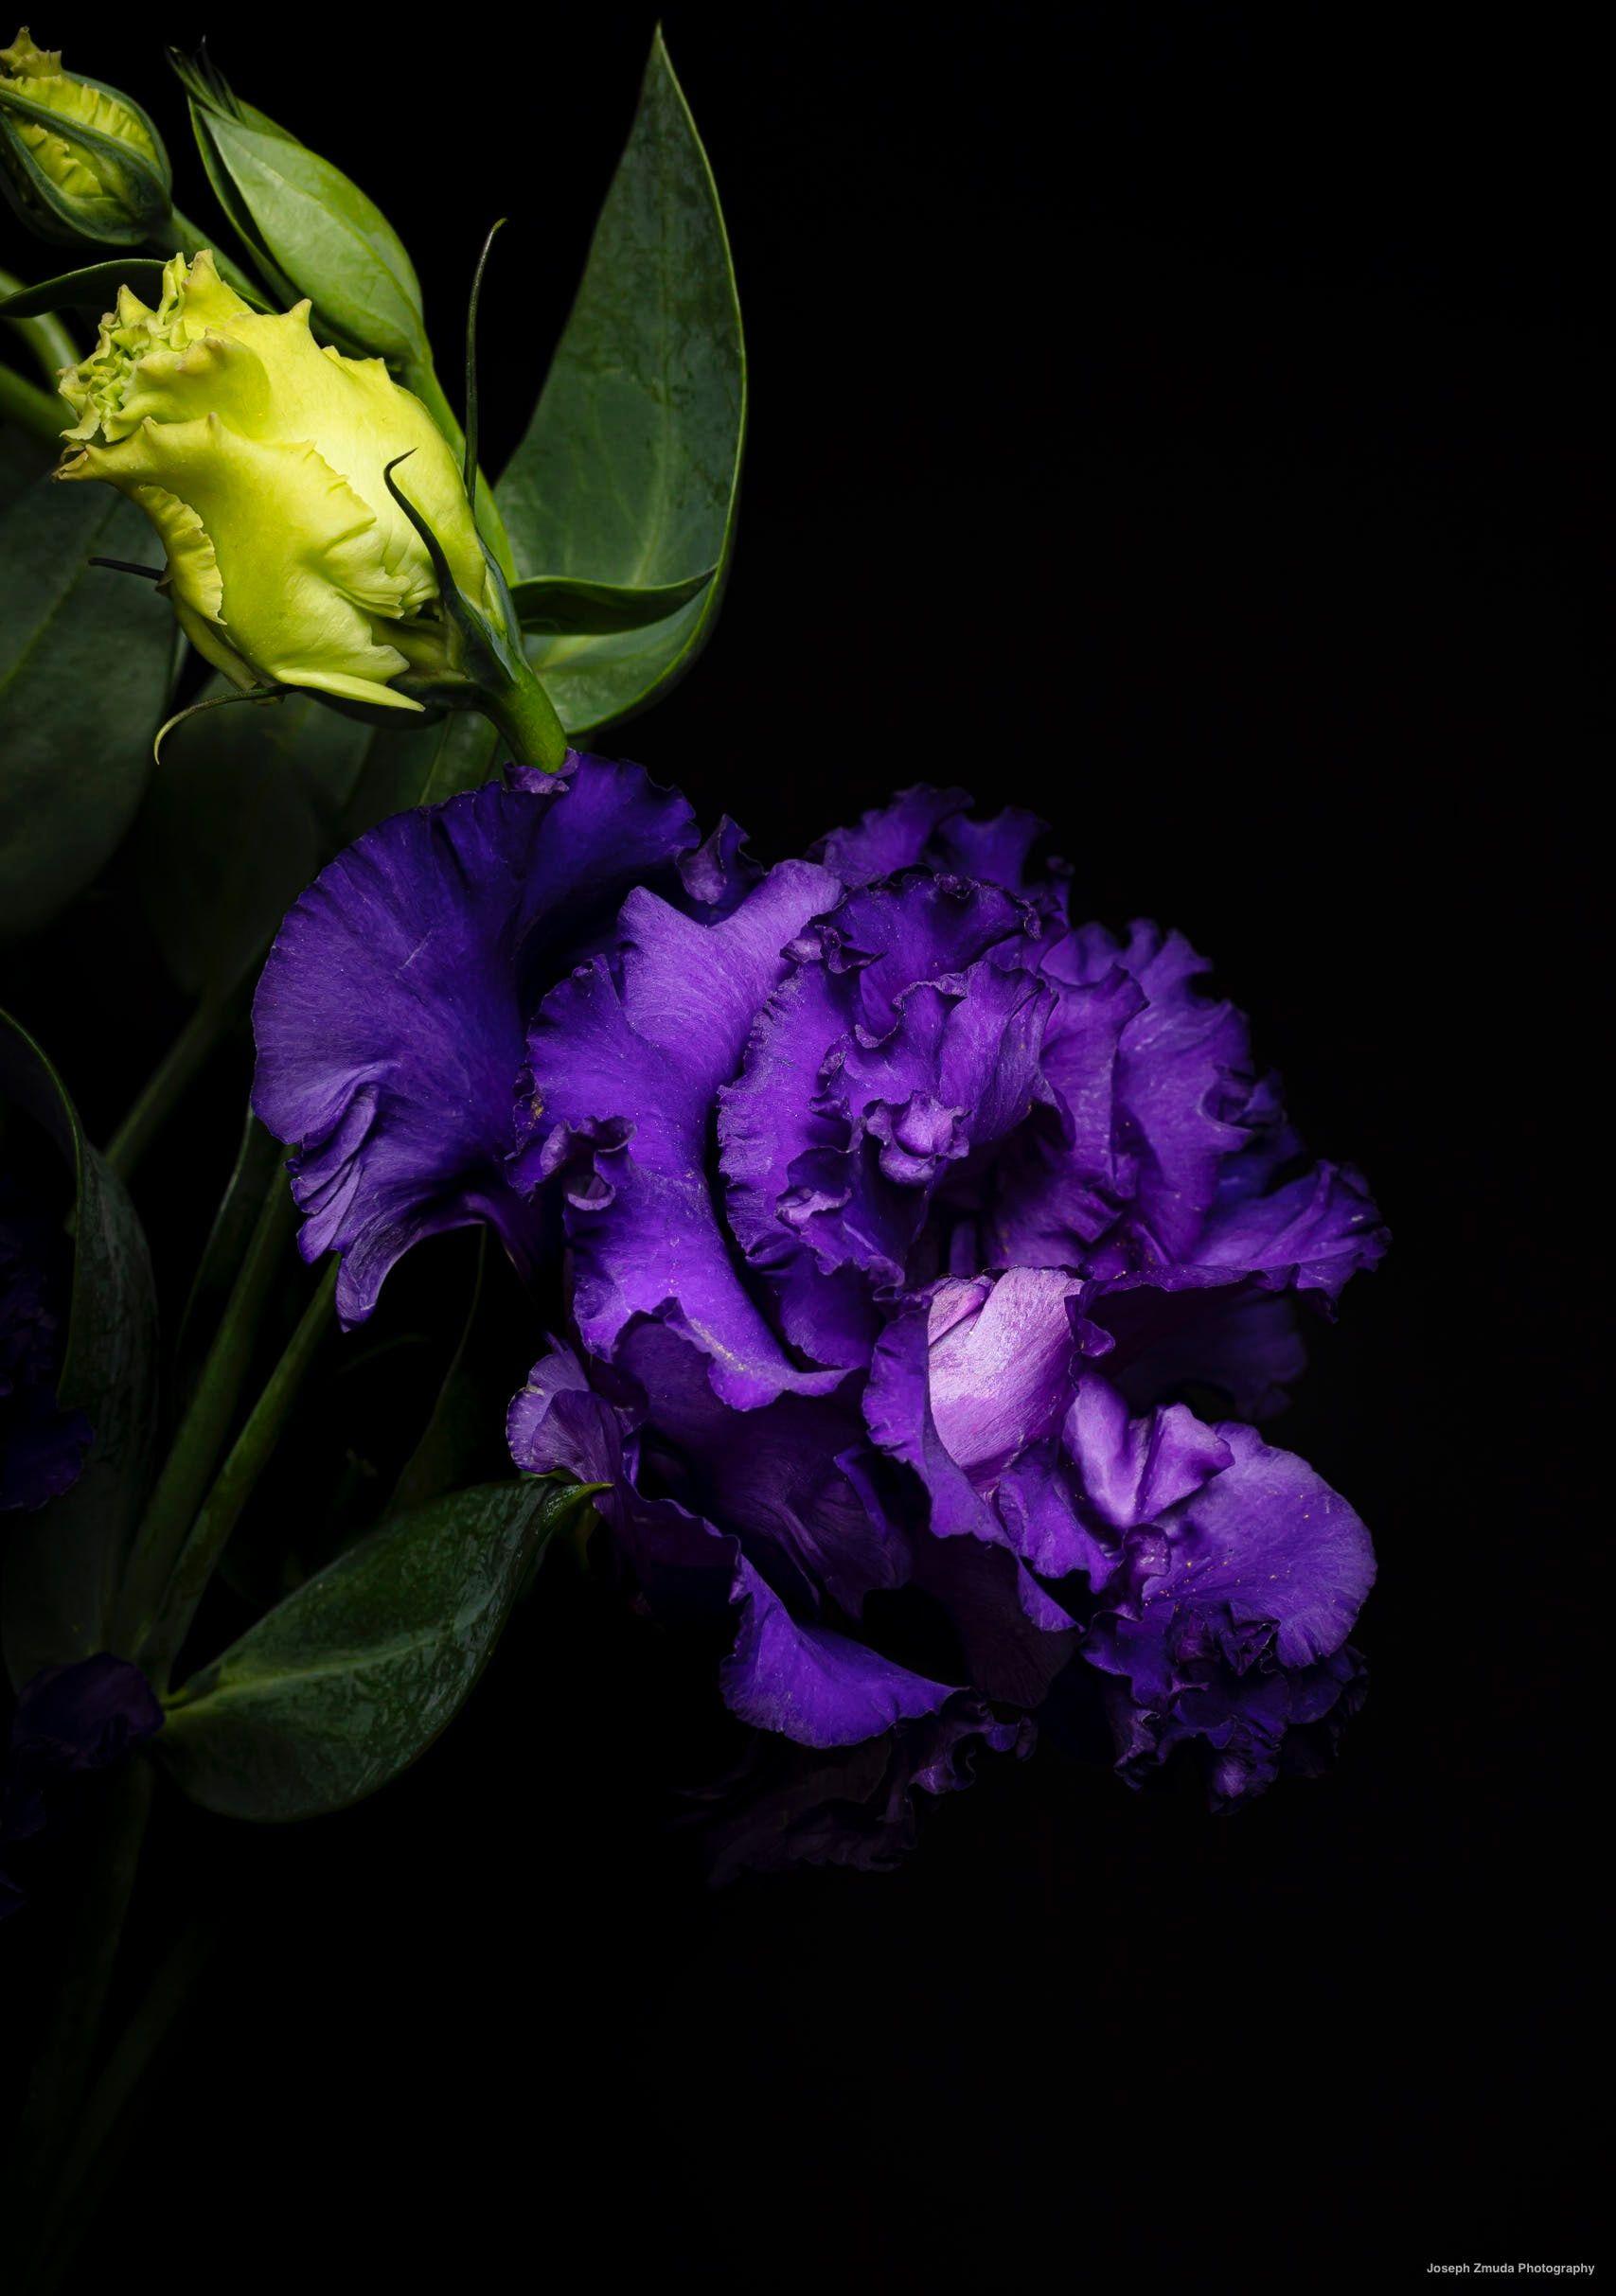 Ruffled Petals Purple Lisianthus Flowers Plants Photography Photographers Macro Macrophoto In 2020 Good Morning Flowers Flowers Photography Pretty Flowers